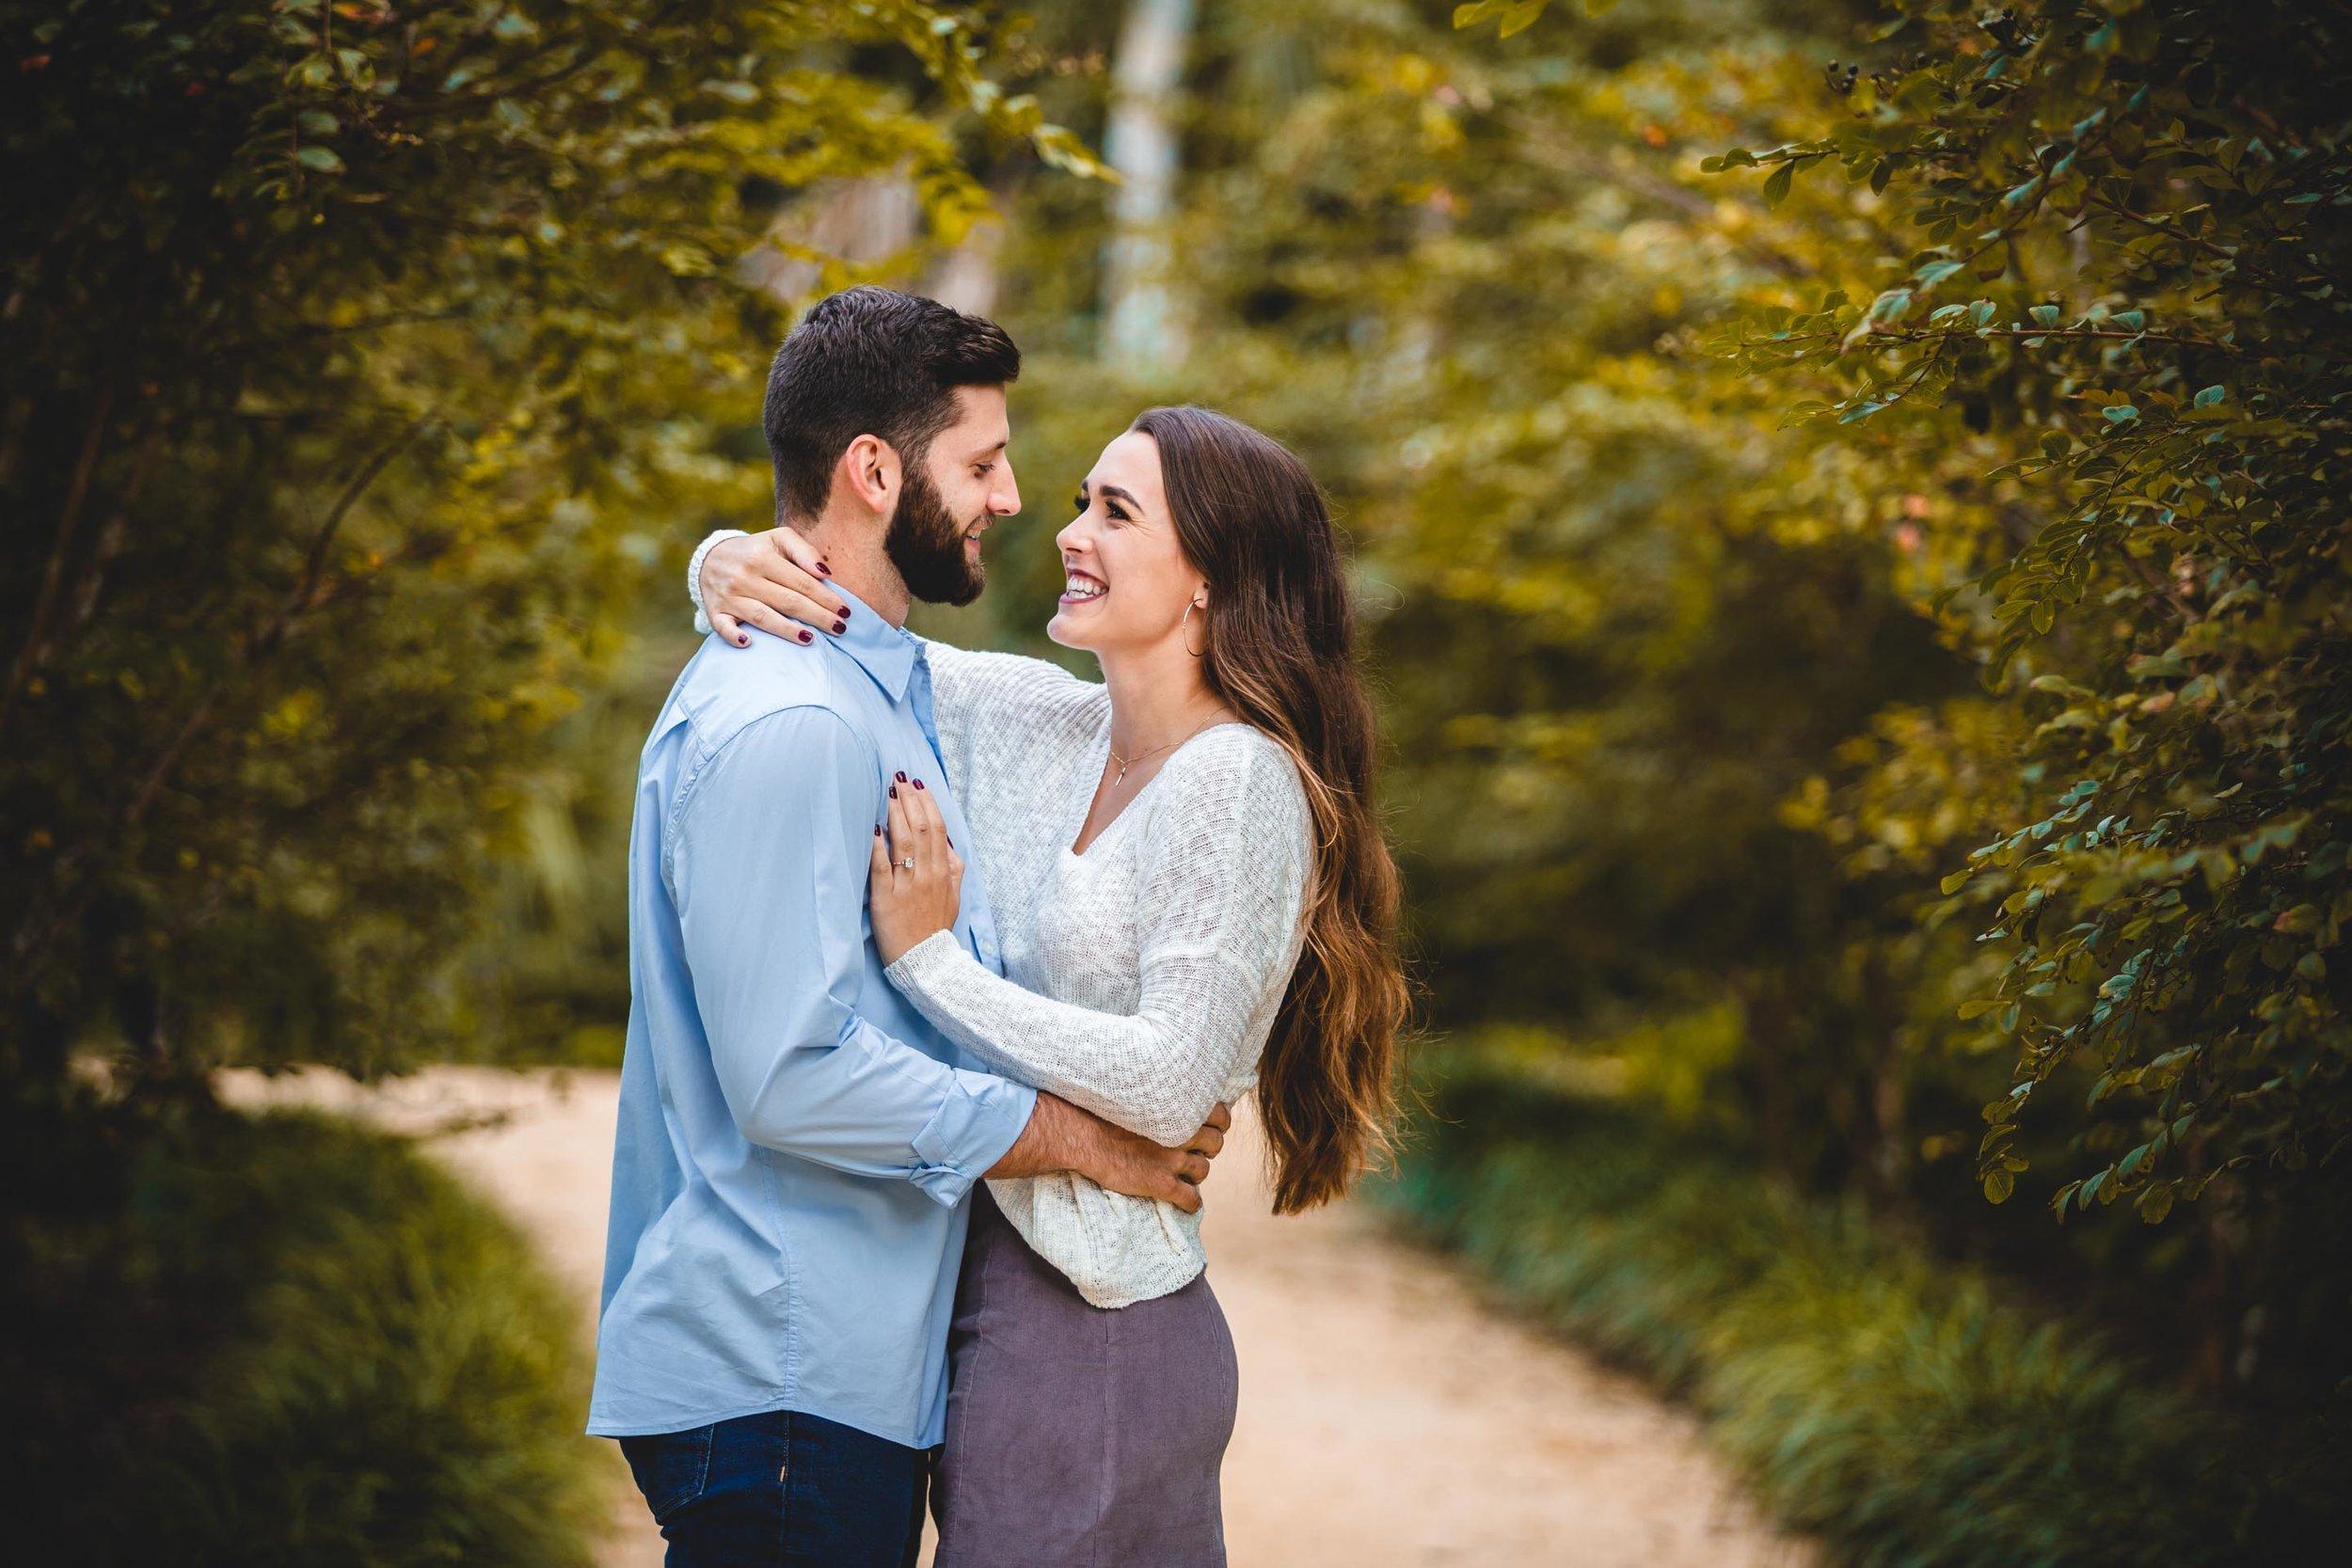 adam-szarmack-jacksonville-wedding-photographer-palm-coast-washing-oaks-garden-state-park-engagement-17.jpg